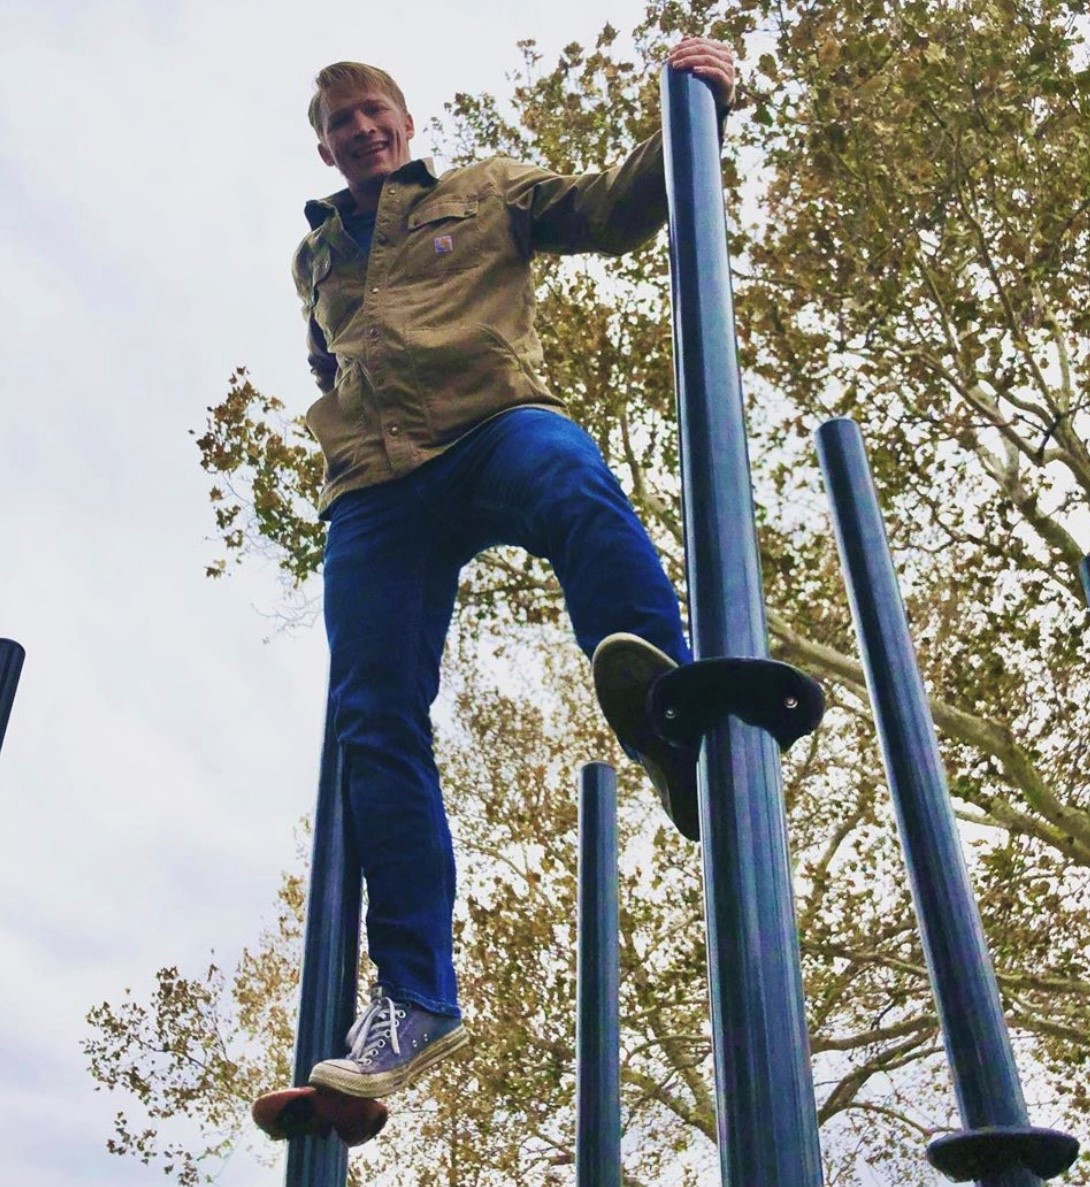 Boy having fun in the park